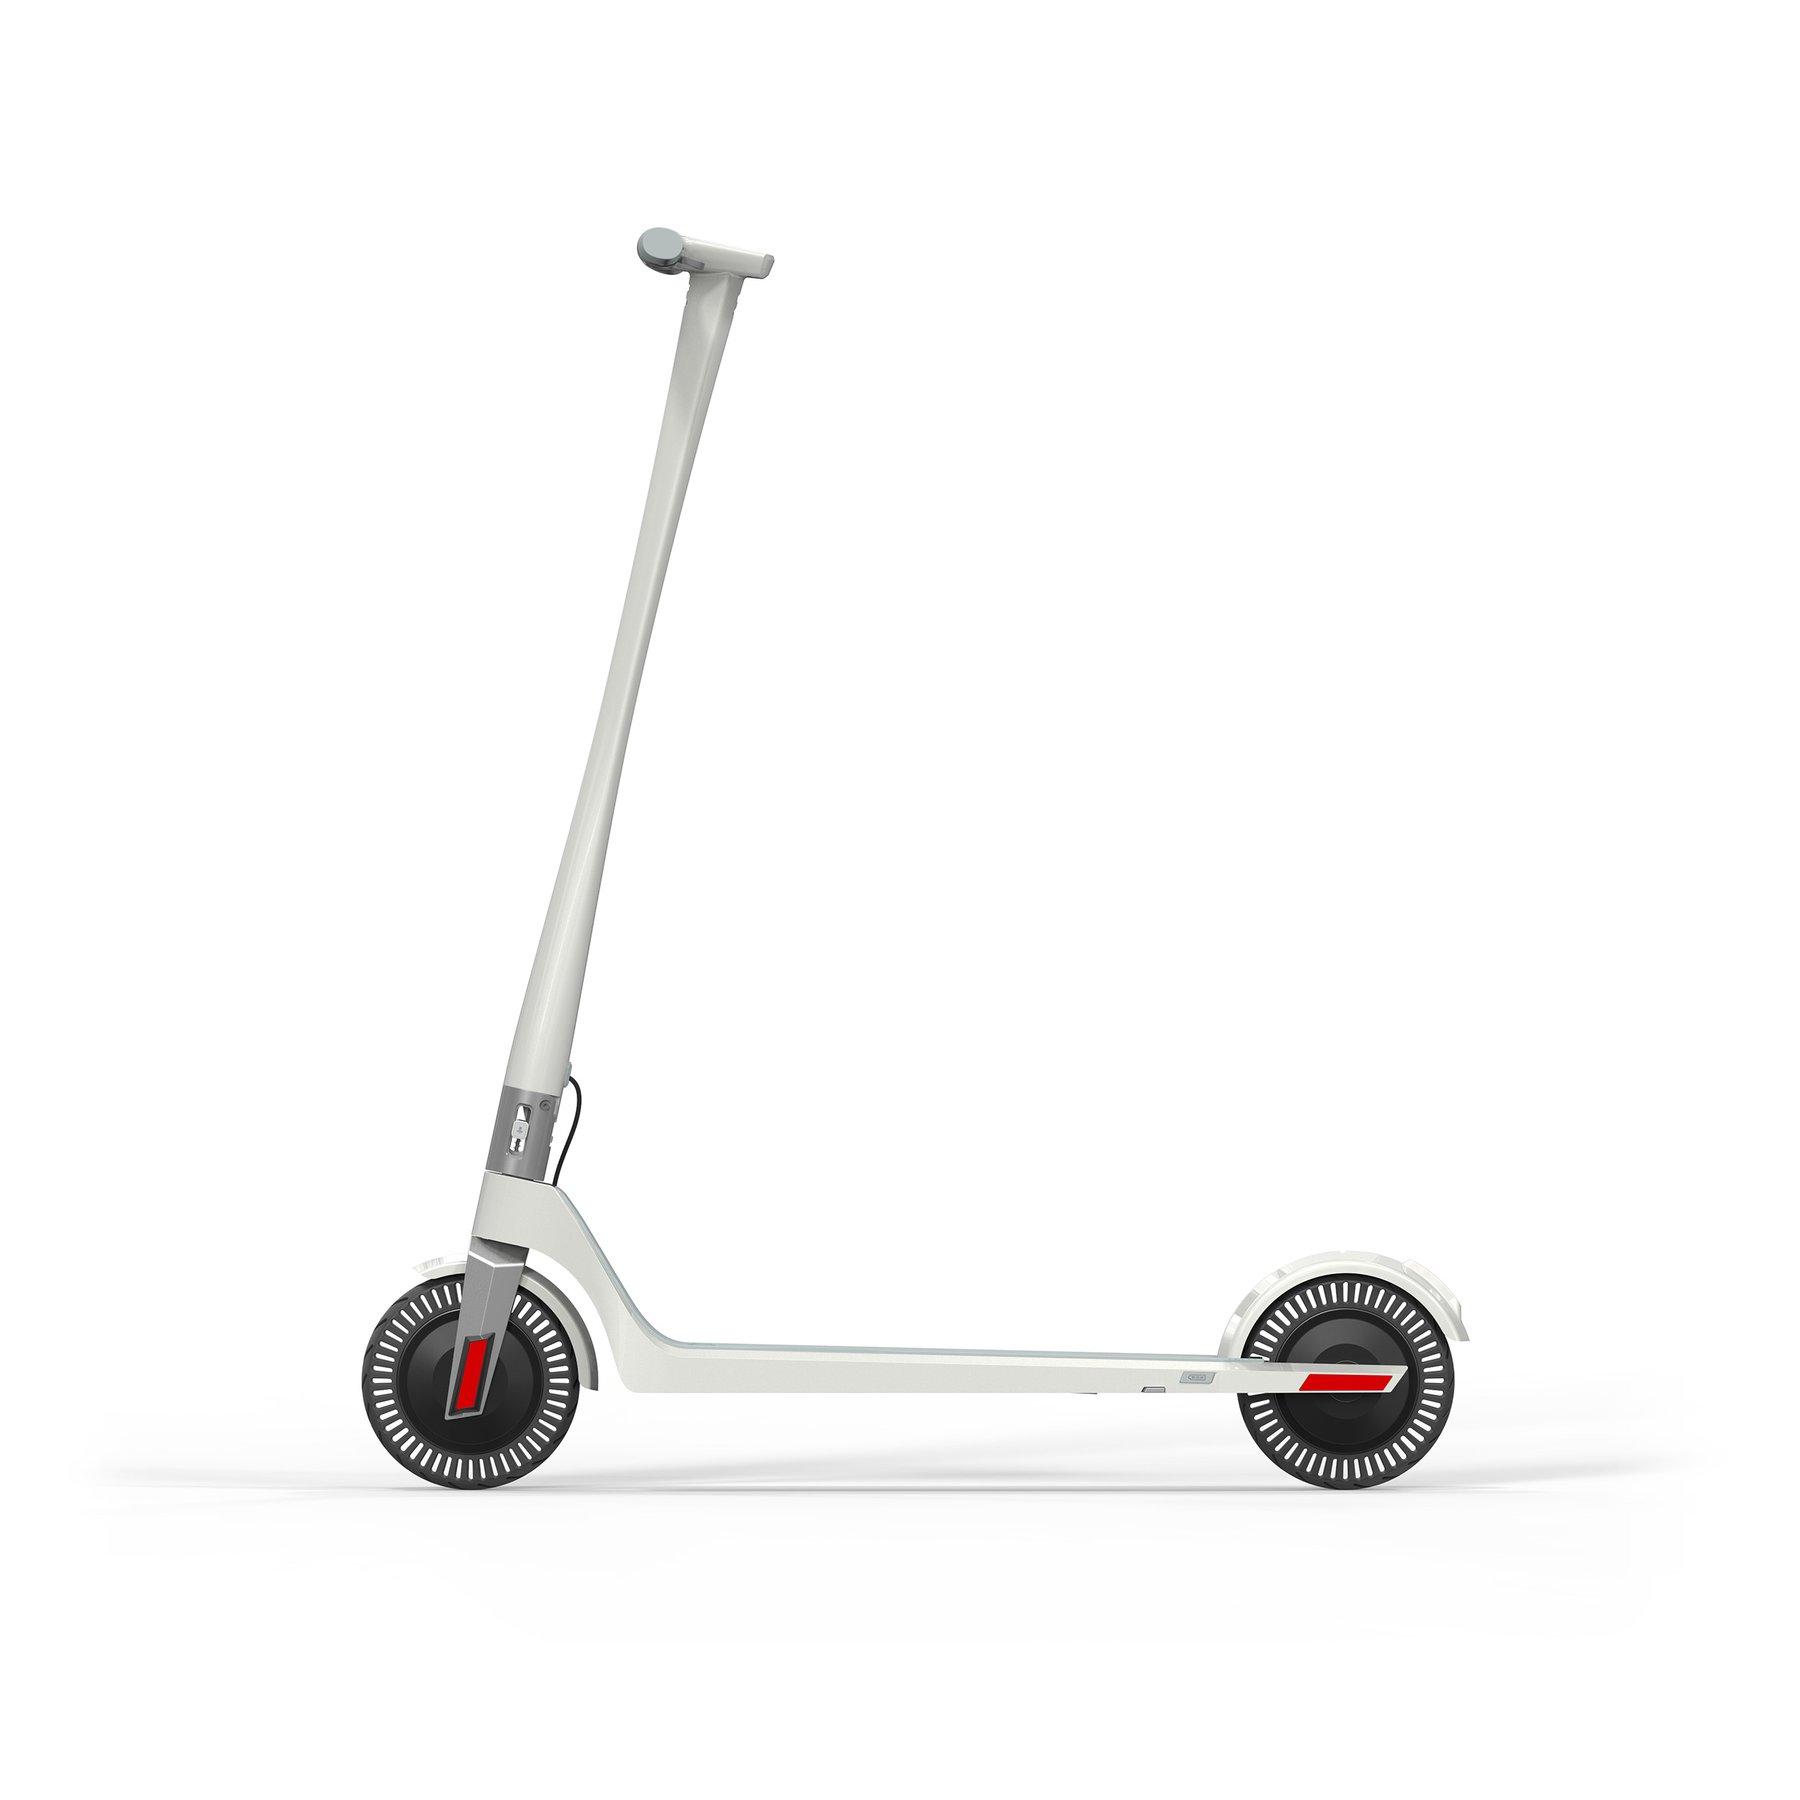 scooter_sea_salt_01_1800x1800.jpg